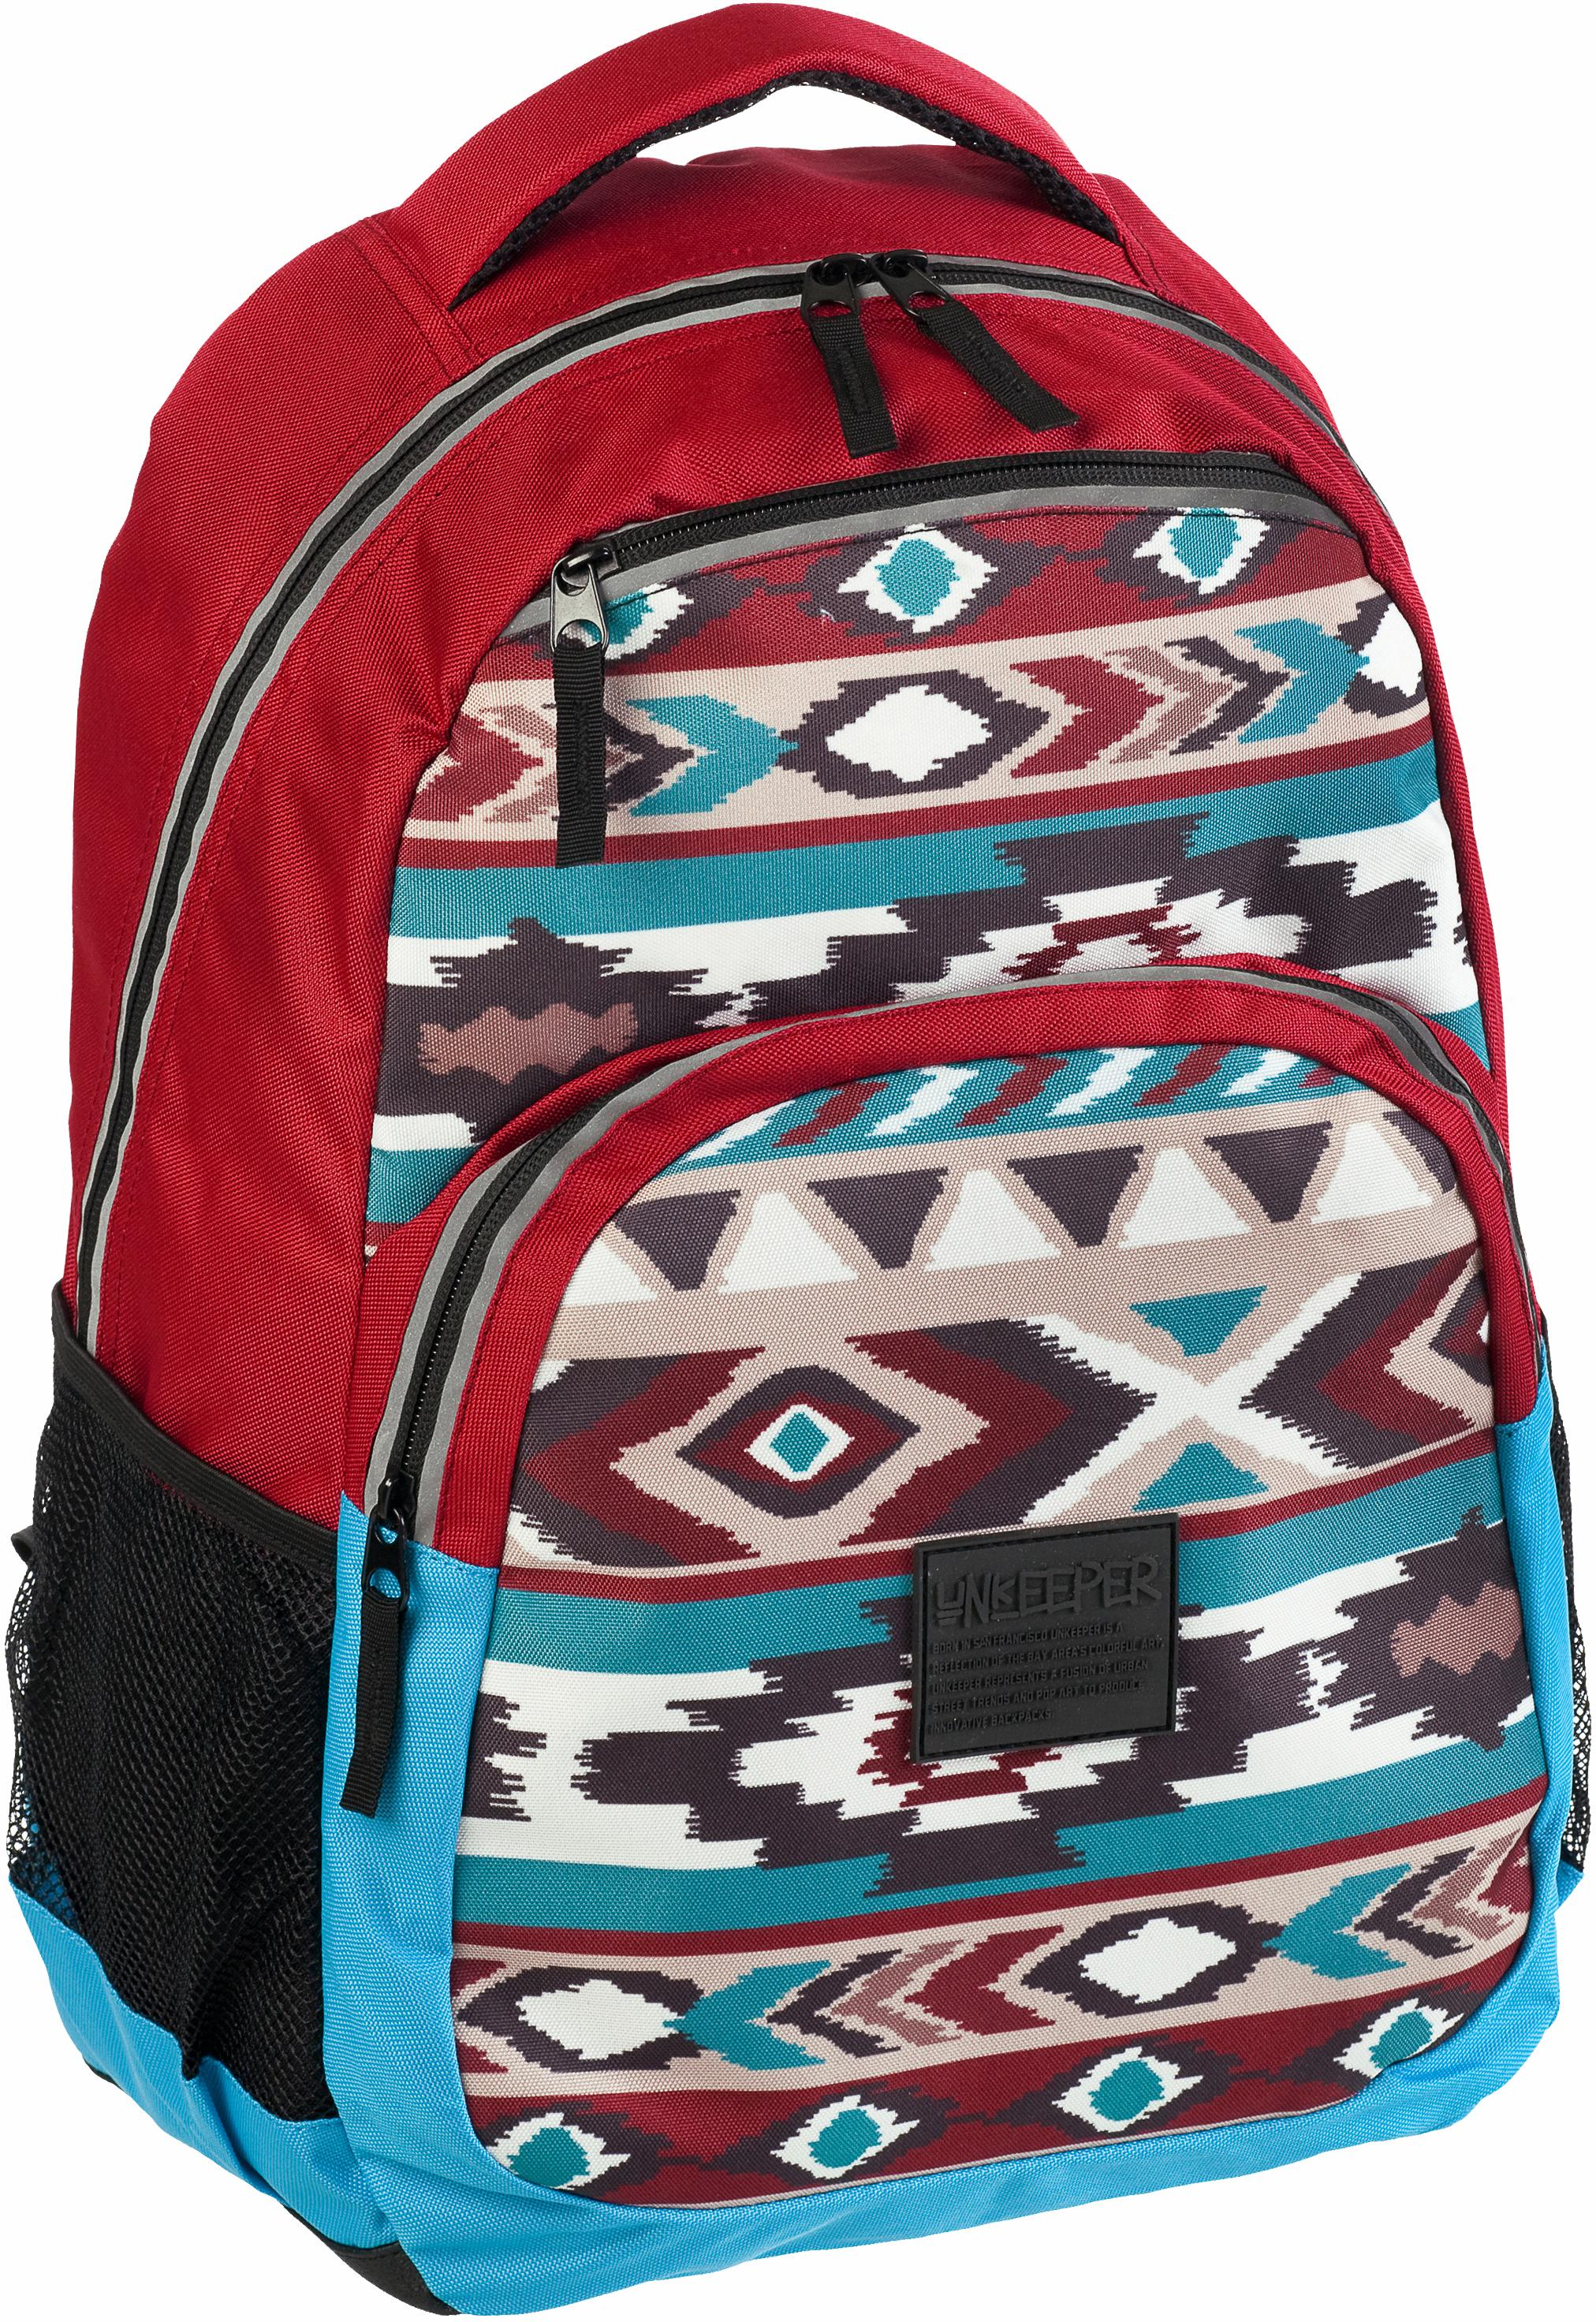 Unkeeper Rucksack, »Ethnic, Adventure Backpack«   Taschen > Rucksäcke > Sonstige Rucksäcke   Rot   UNKEEPER